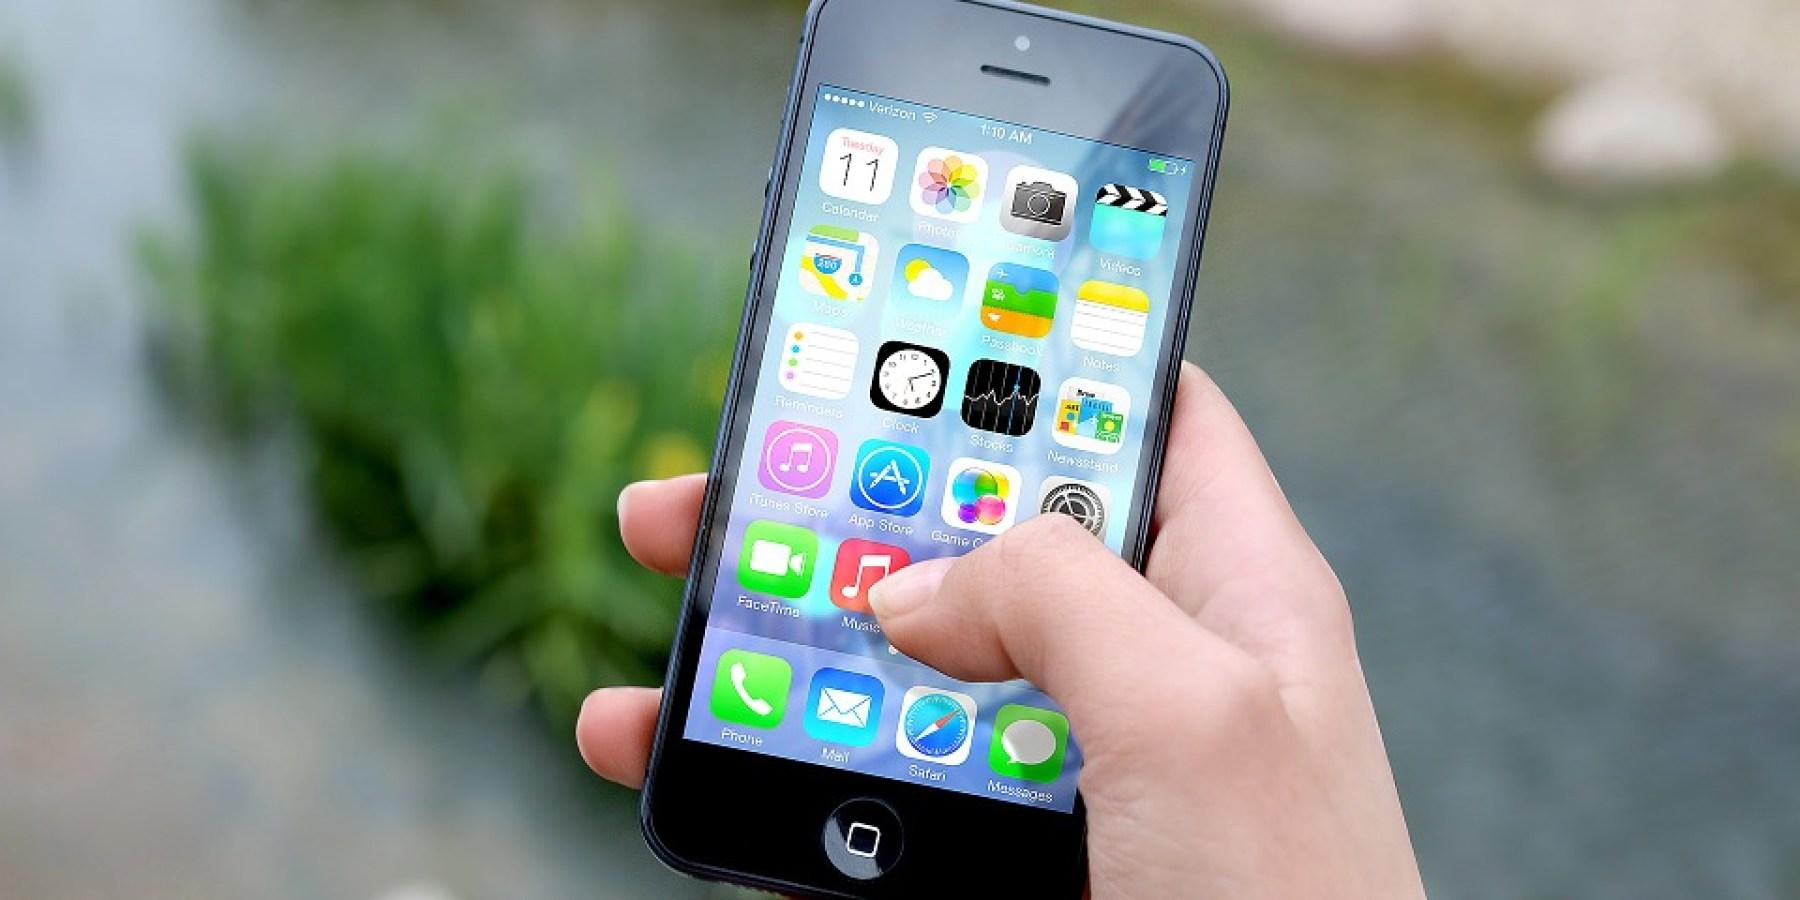 Räuber erbeuten Mobiltelefon